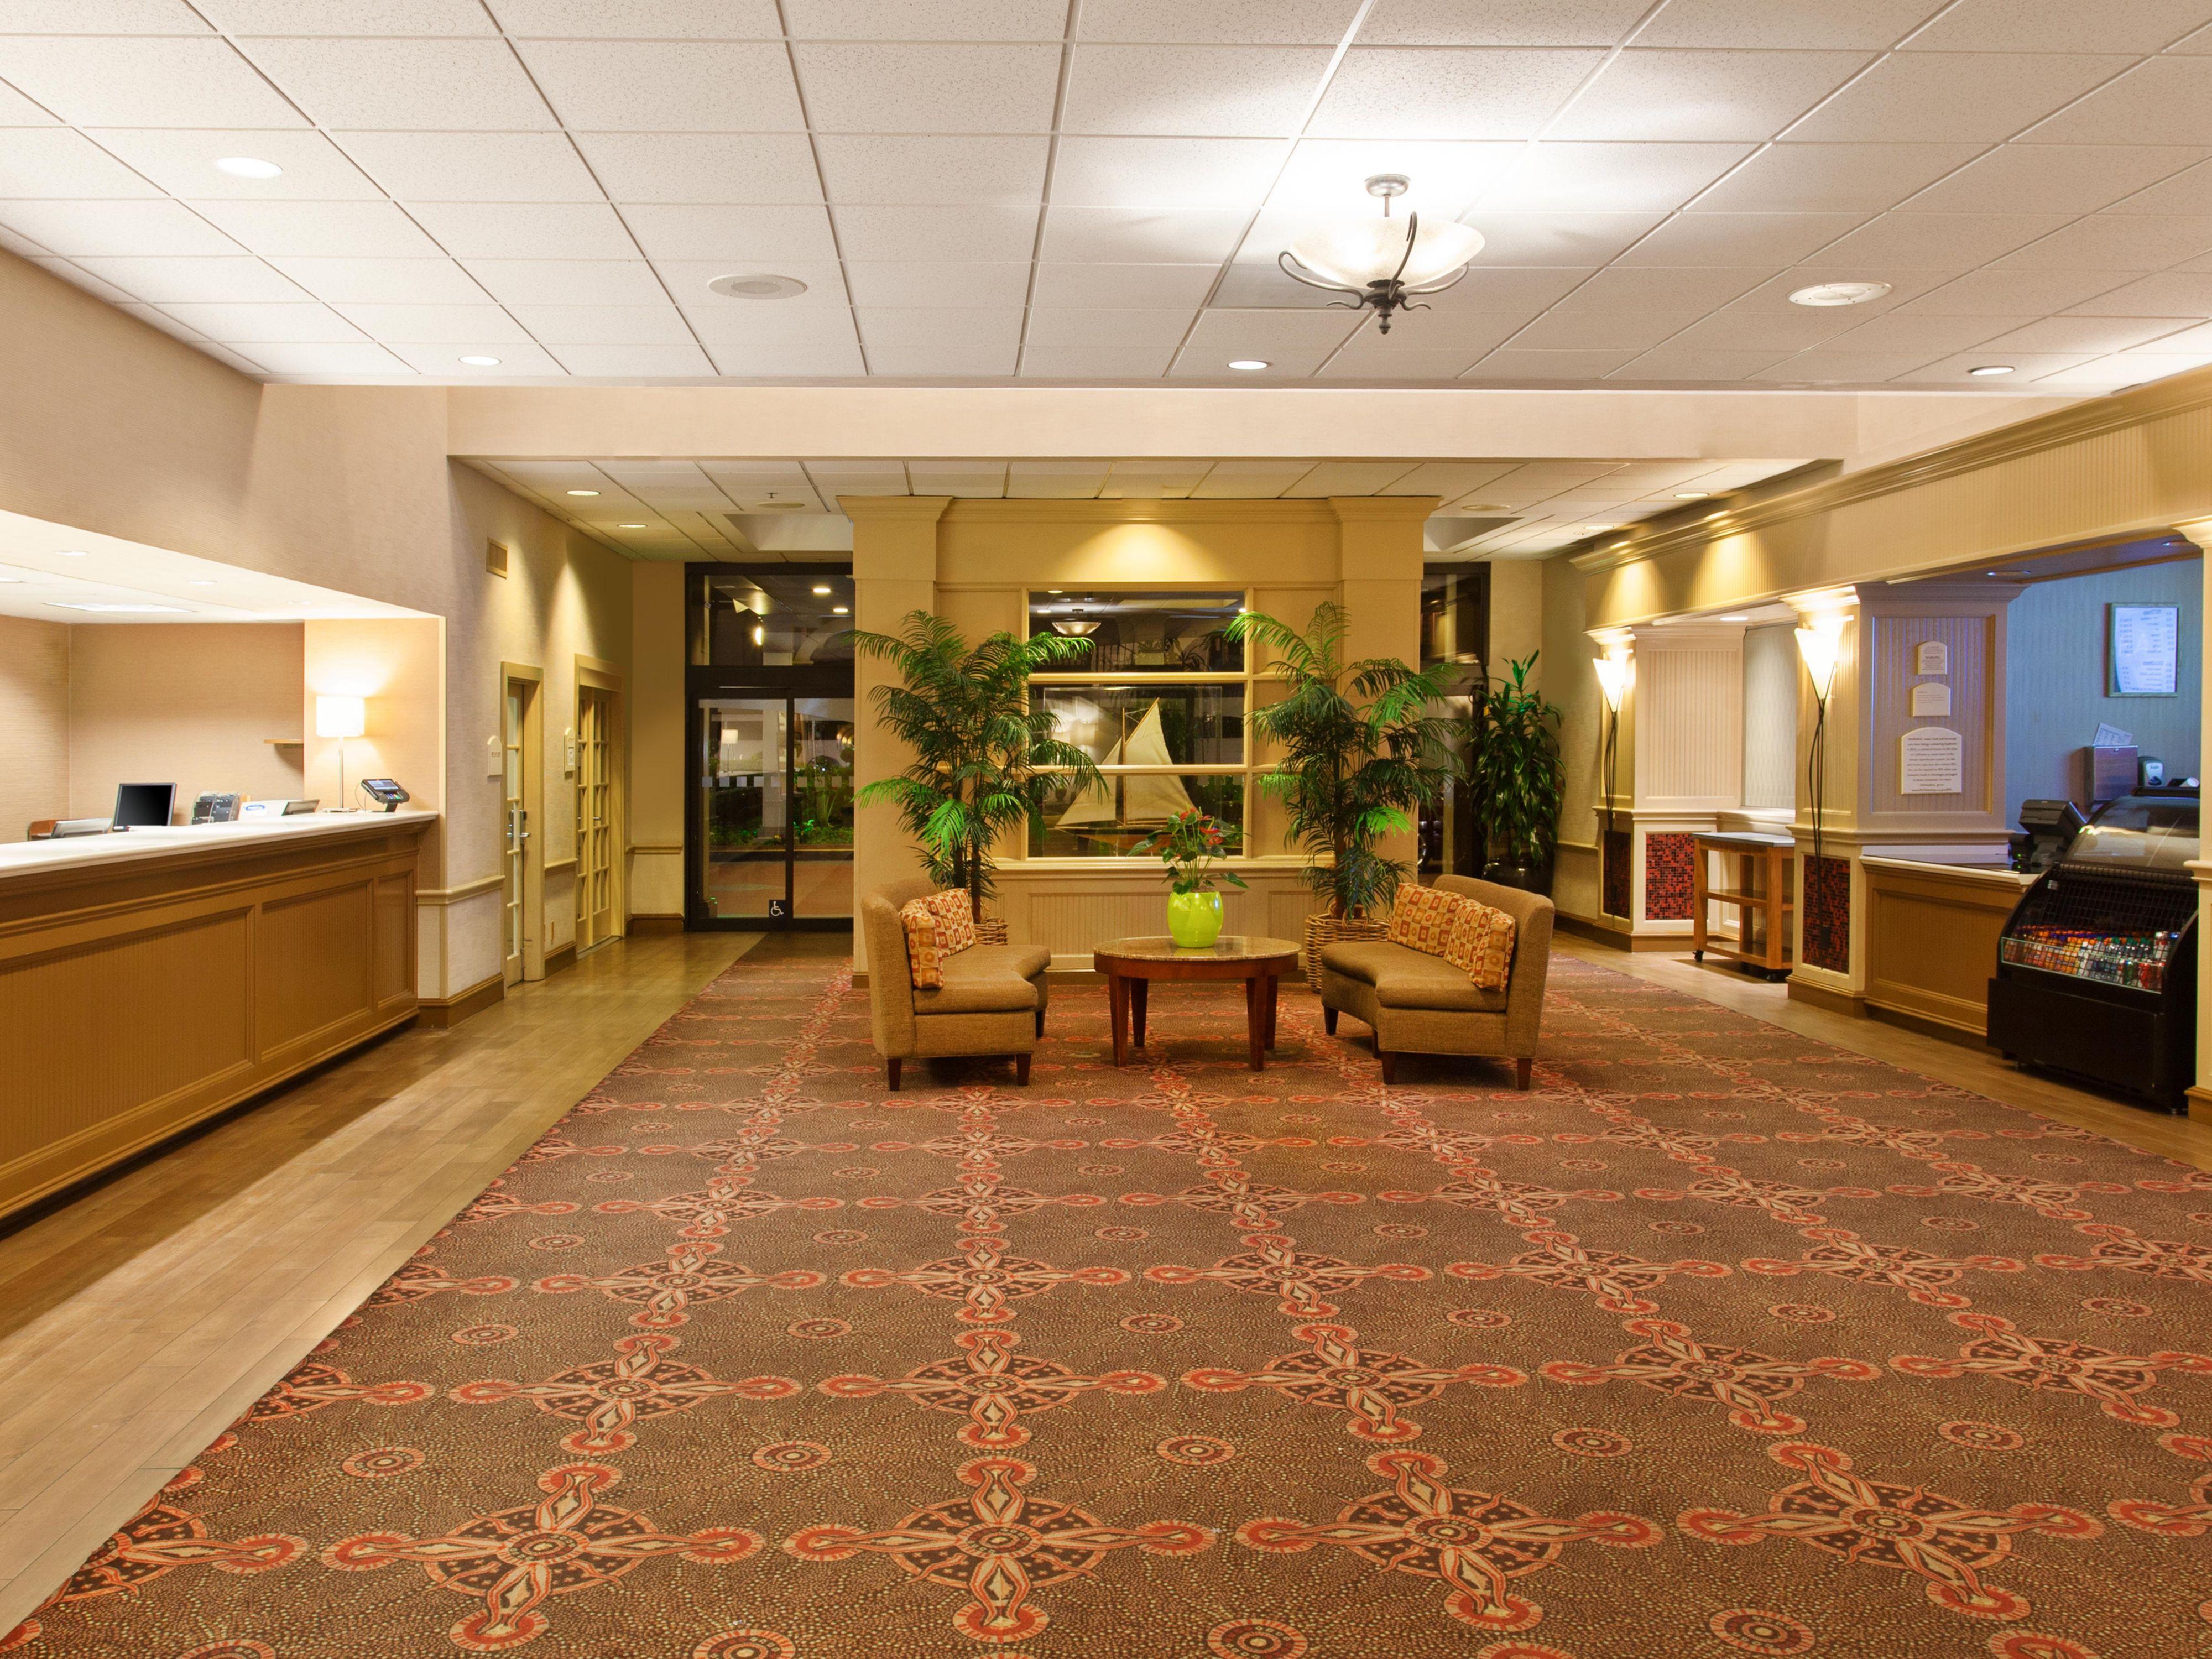 Holiday Inn San Francisco 4836124241 4x3